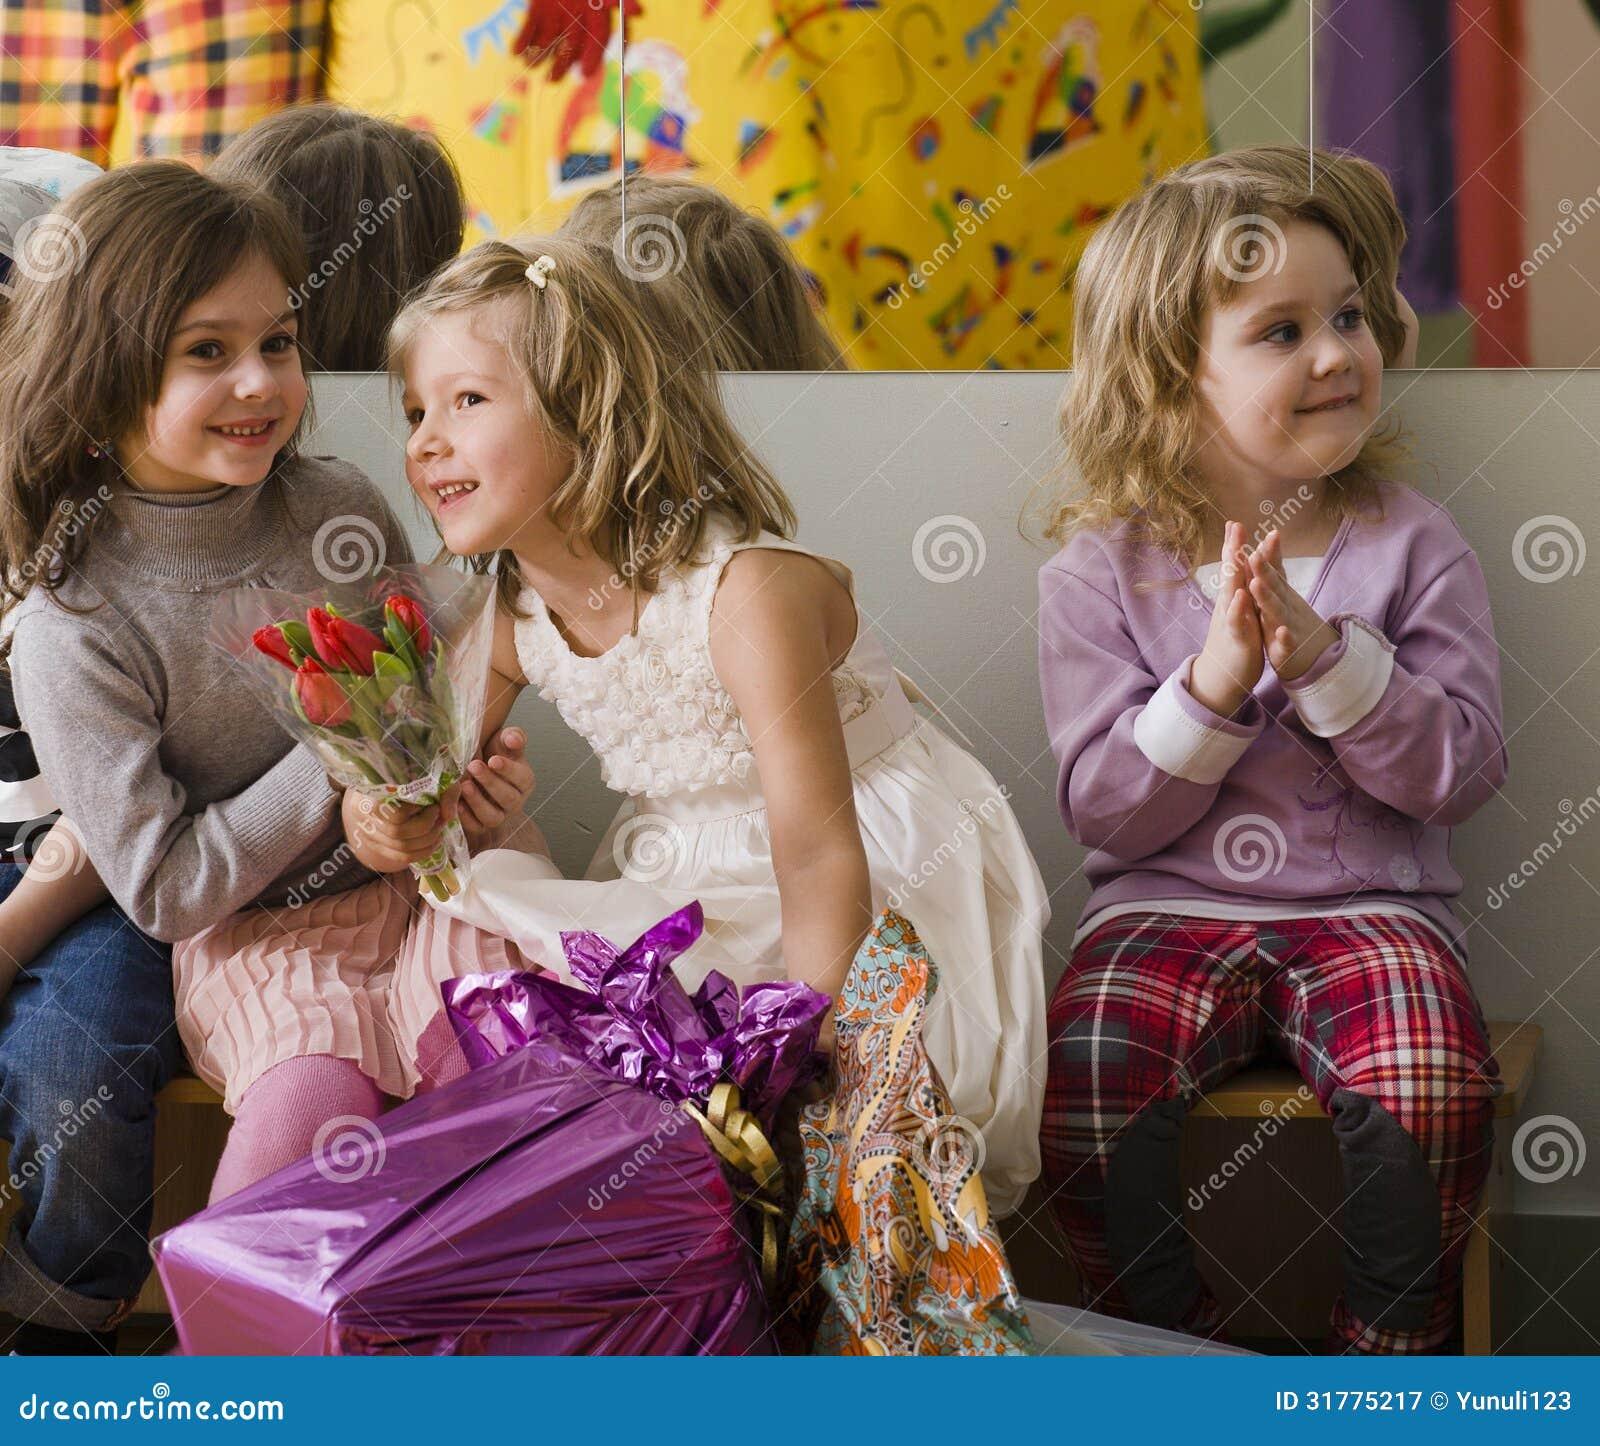 Hree Little Girls At Birthday Party Having Fun Royalty